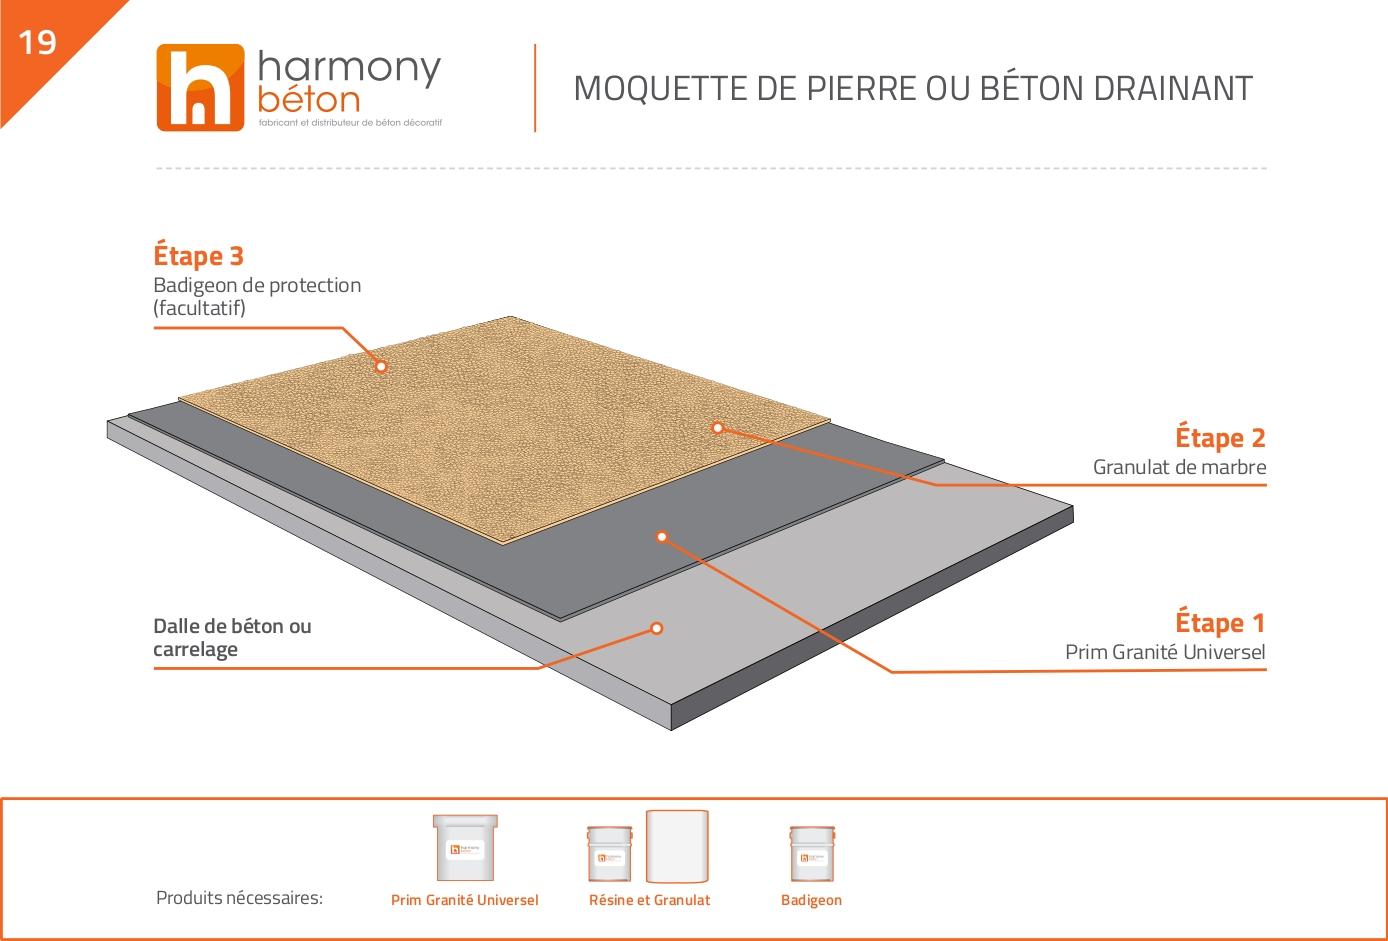 Kit Béton Drainant Kit Moquette De Pierre Harmony Beton